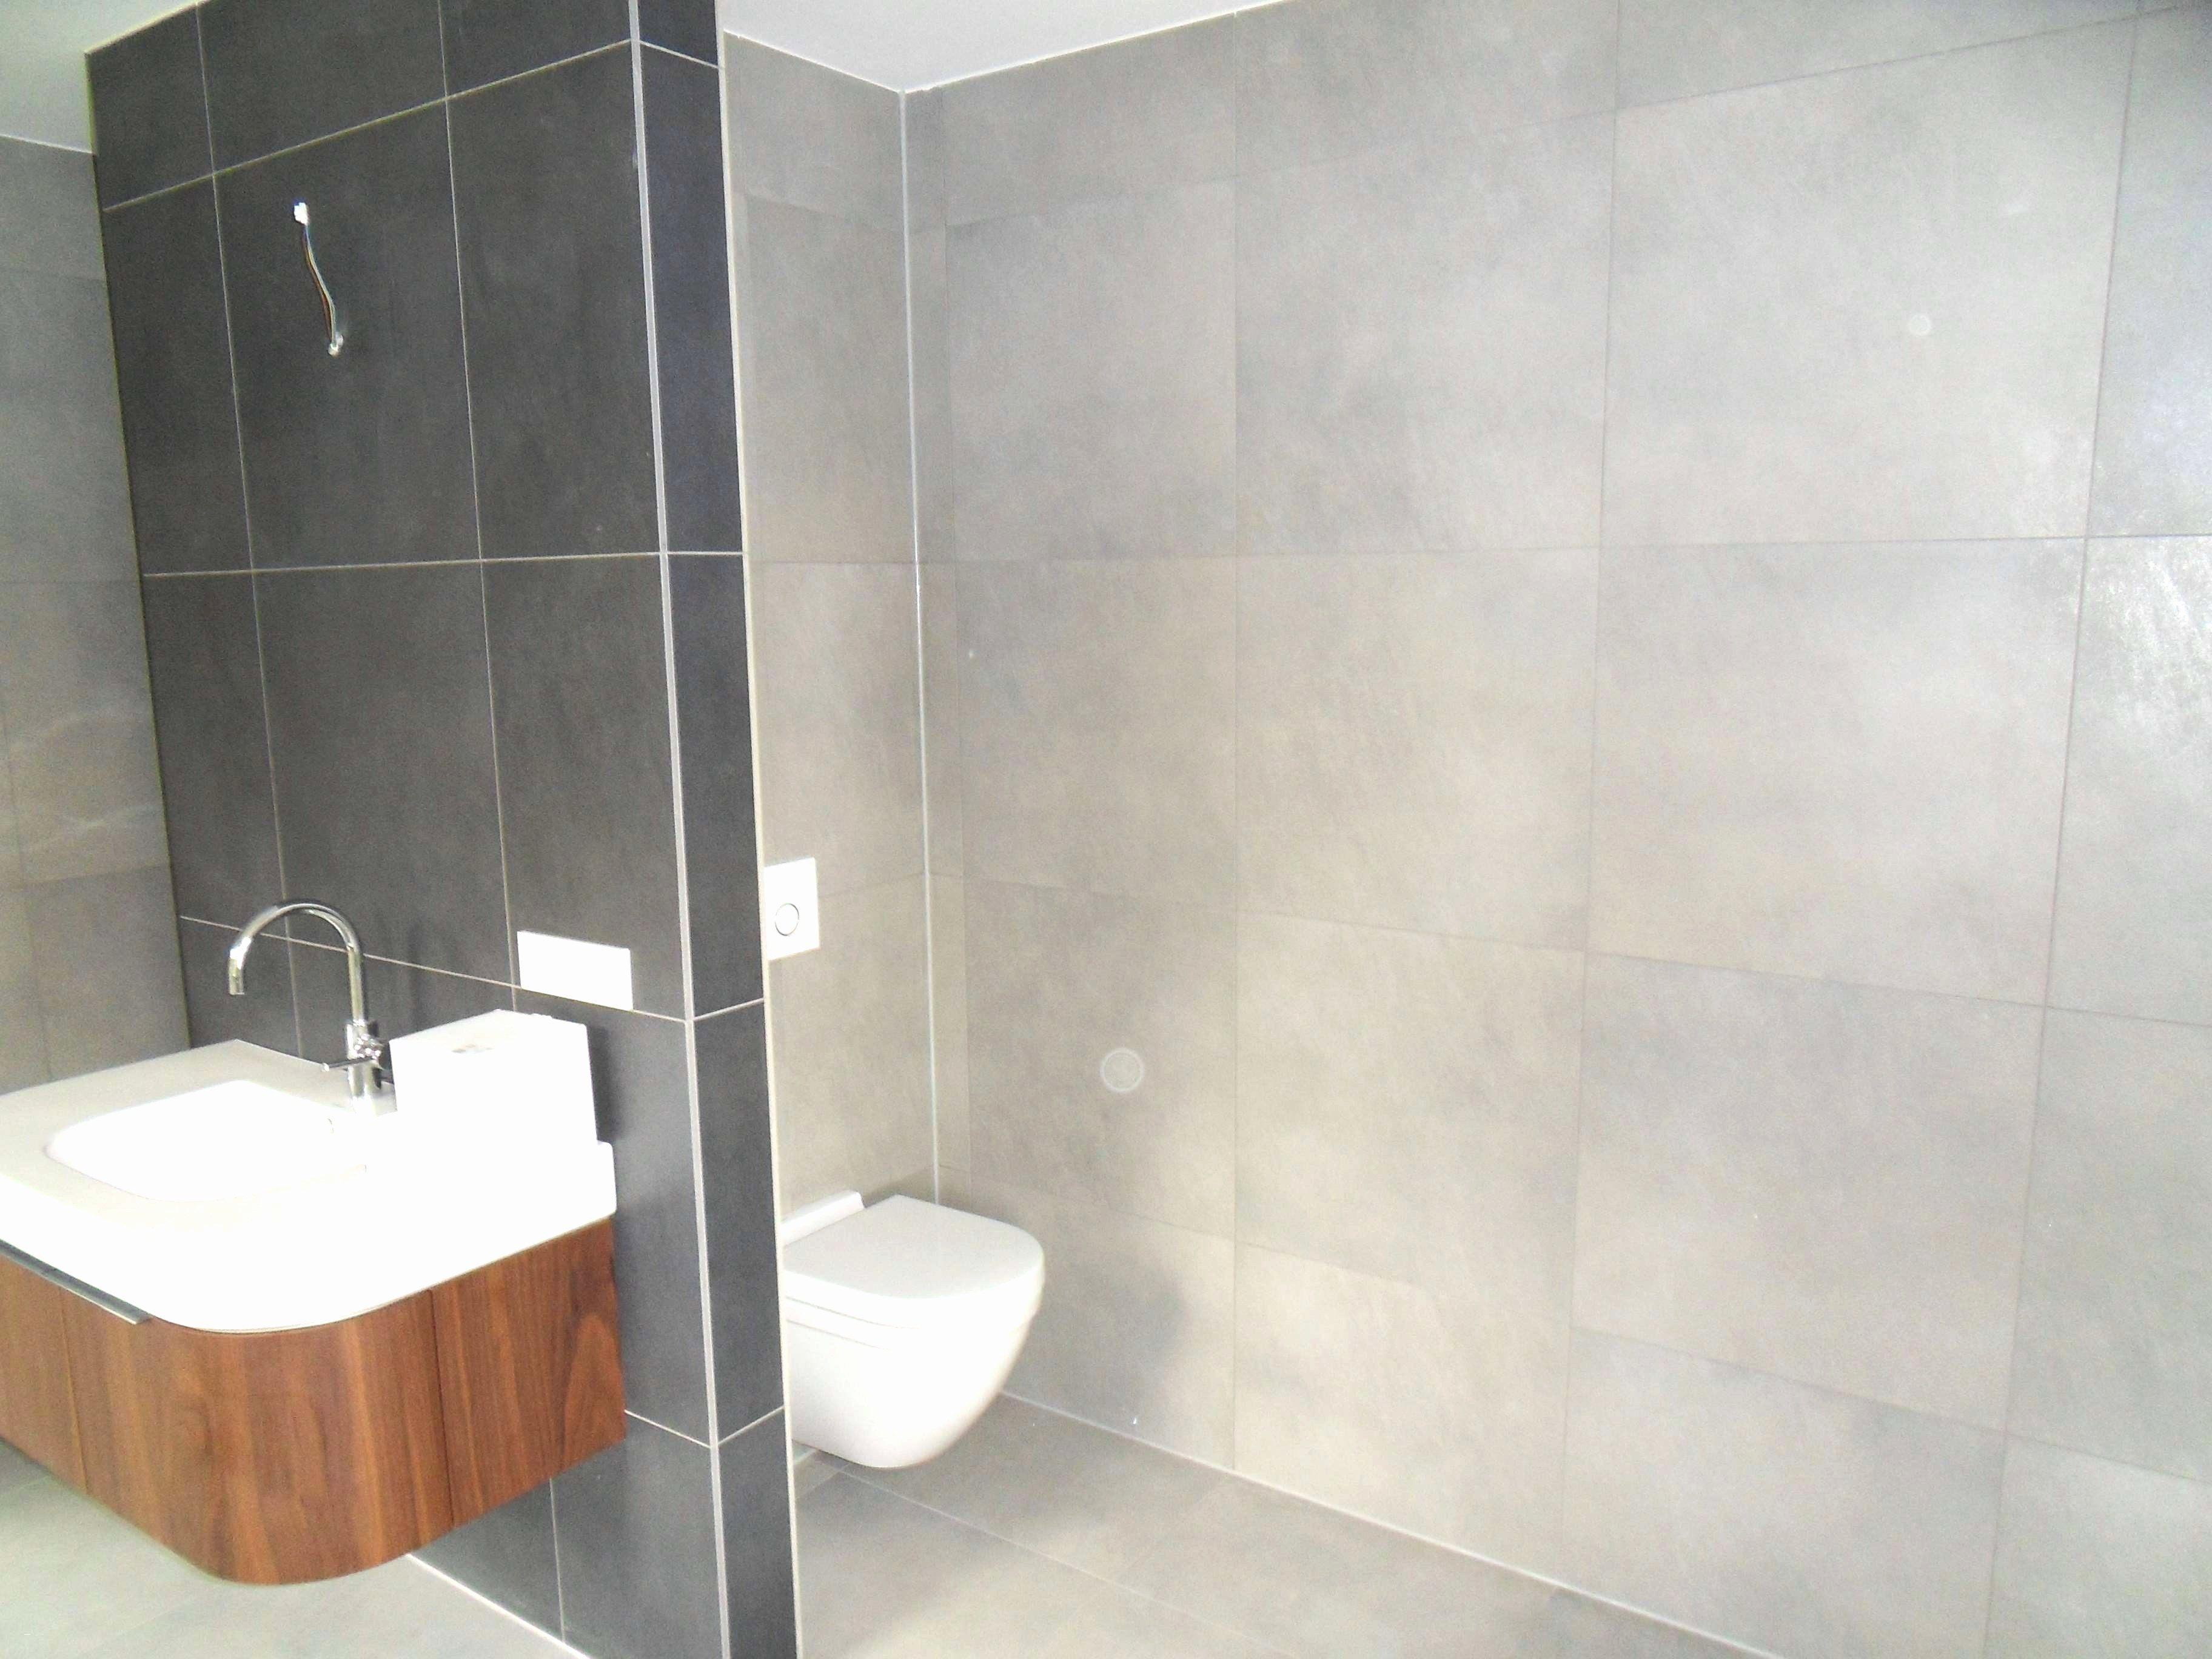 Badezimmer Paneele Statt Fliesen Badezimmer Ideen Modern Bathroom Bathroom Fixtures Bathroom Wall Coverings